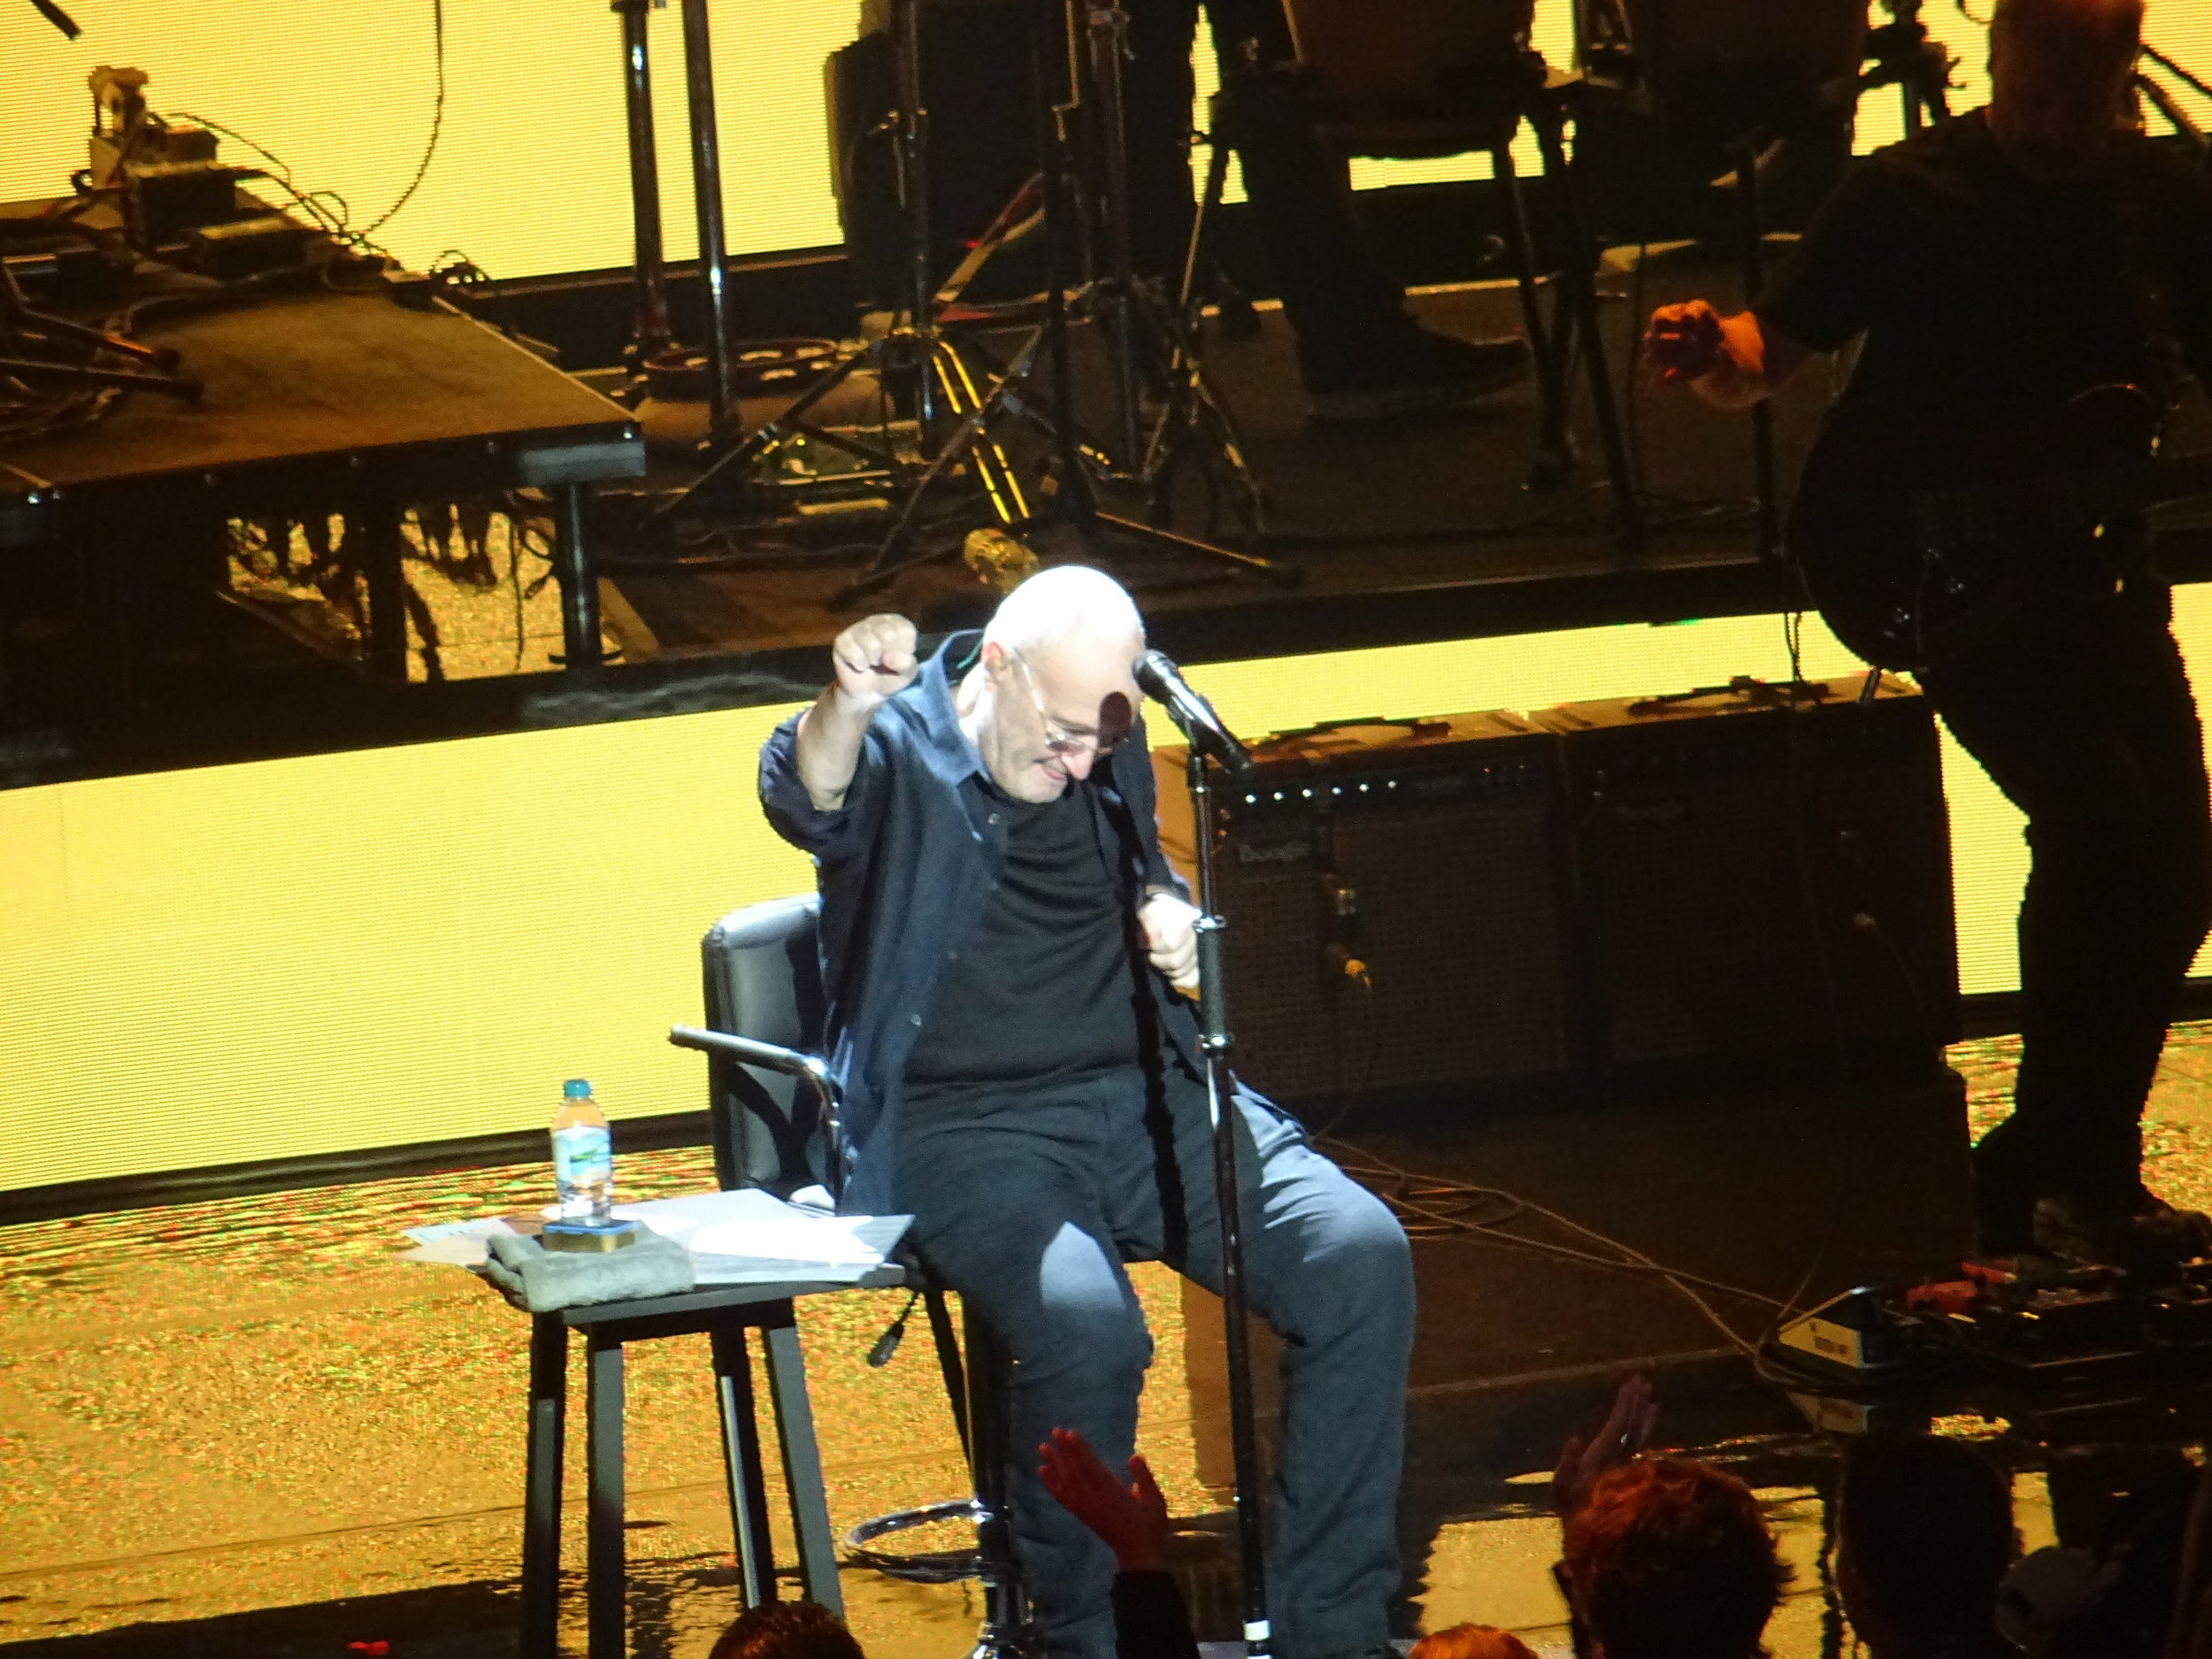 Phil celebrates (c) Philip Giouras @ The Perfect Tempo